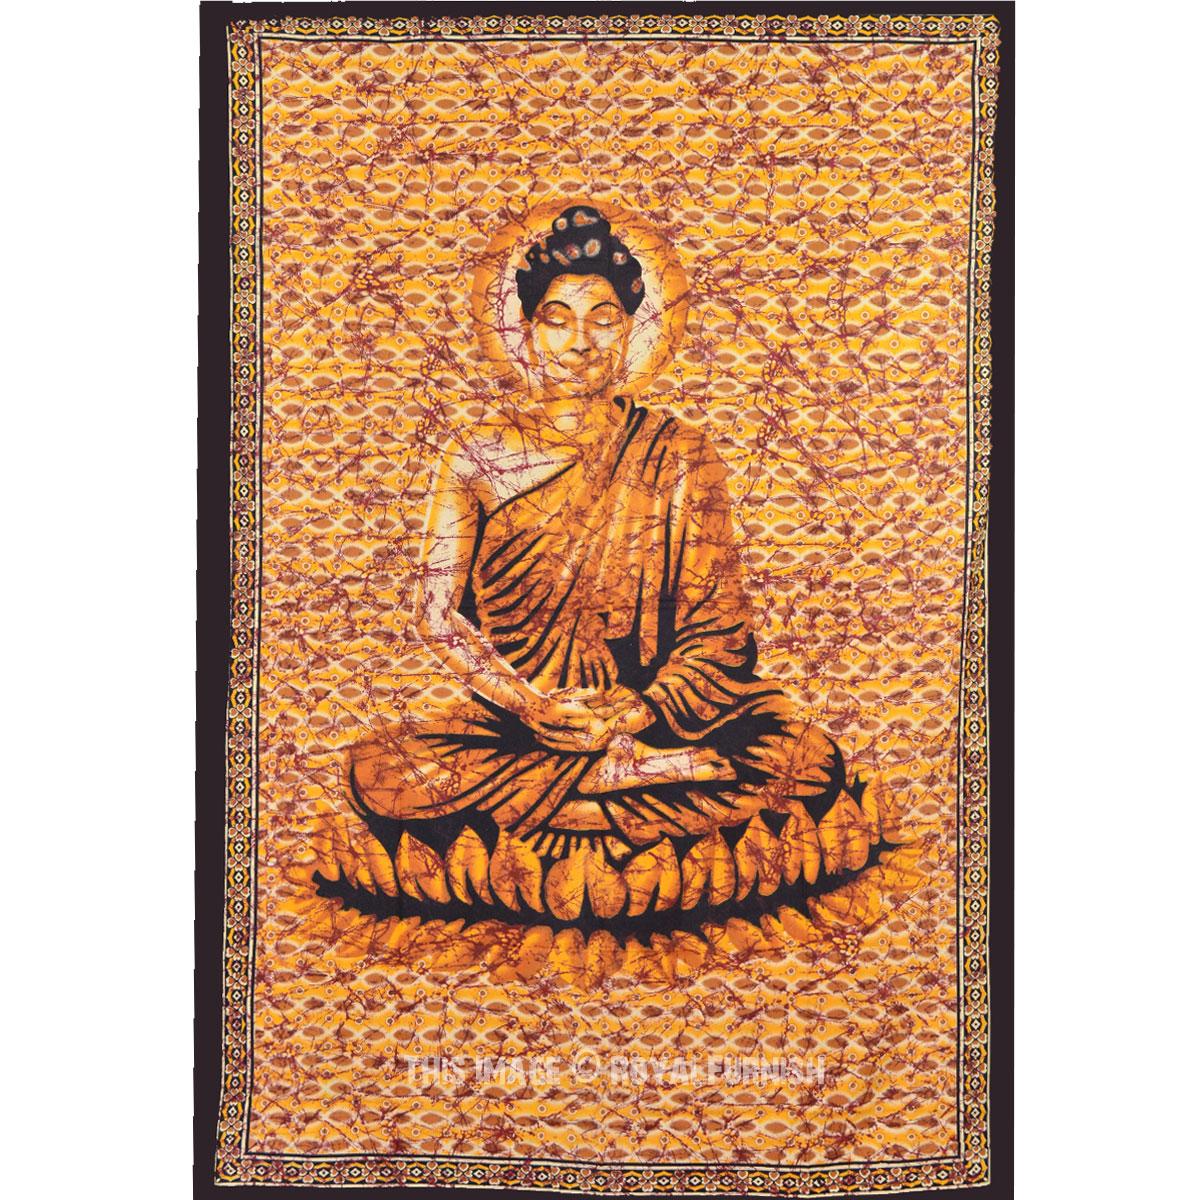 Buddha Tapestry Wall Hangings lotus sitting meditation buddha tapestry wall hanging